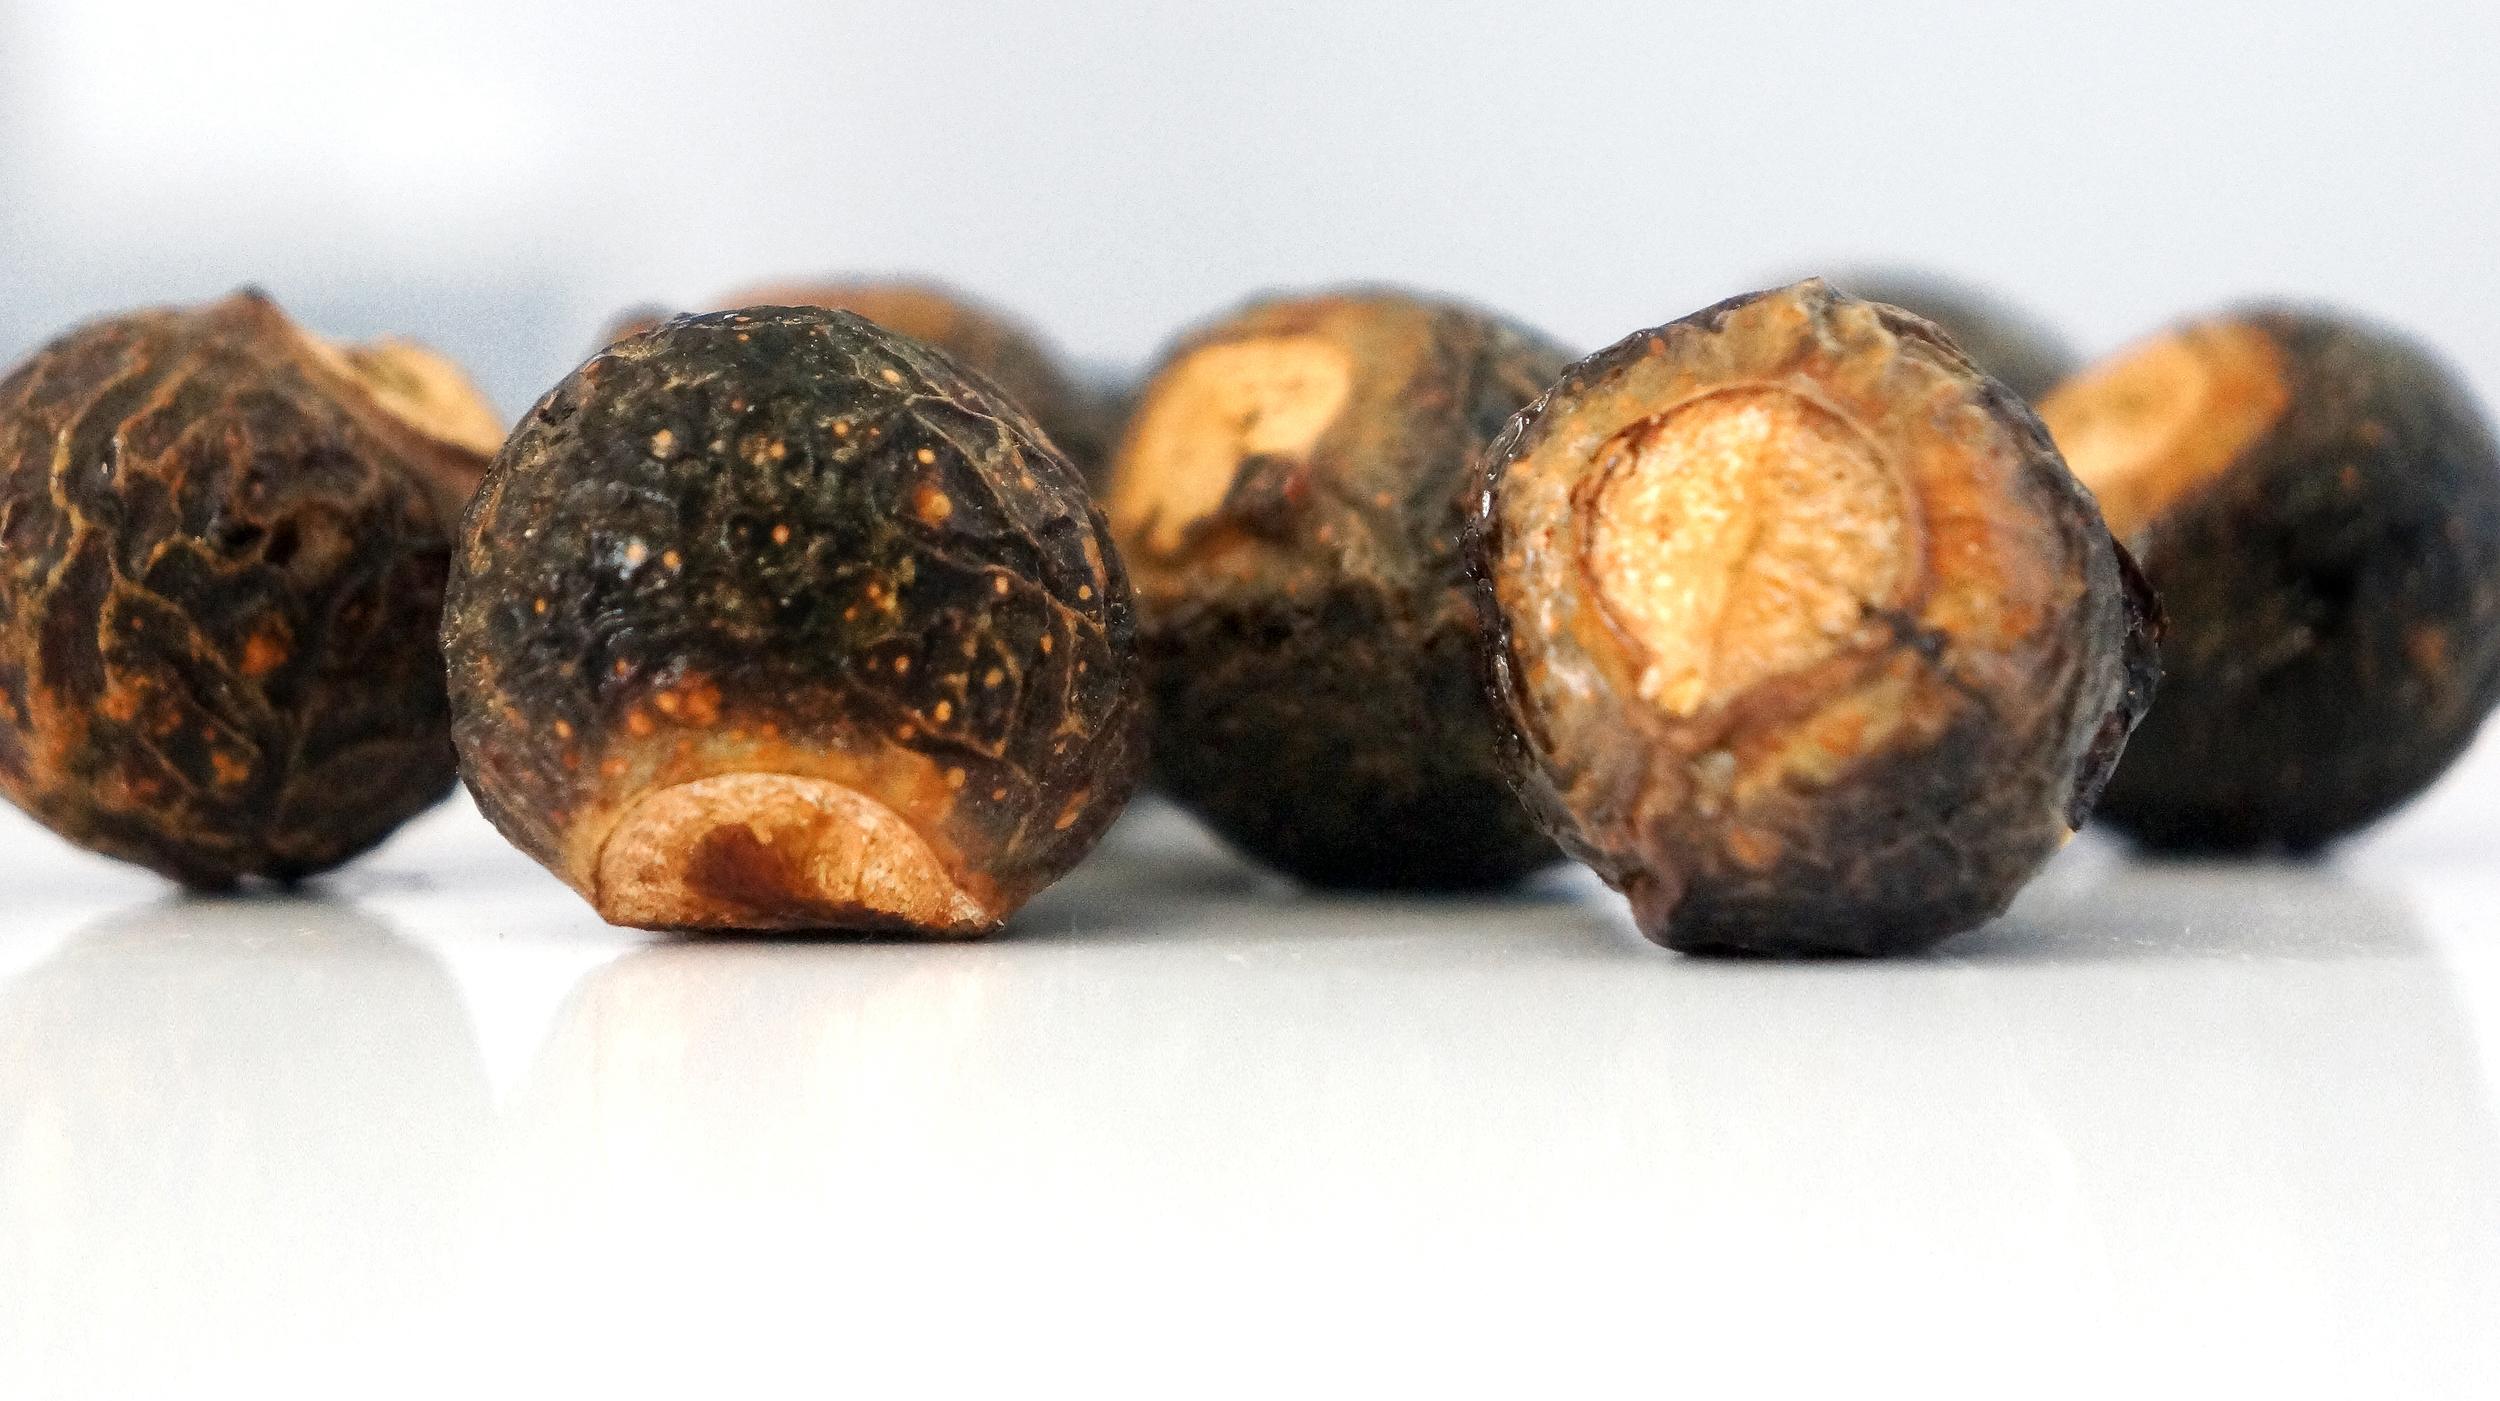 Whole Soapnuts